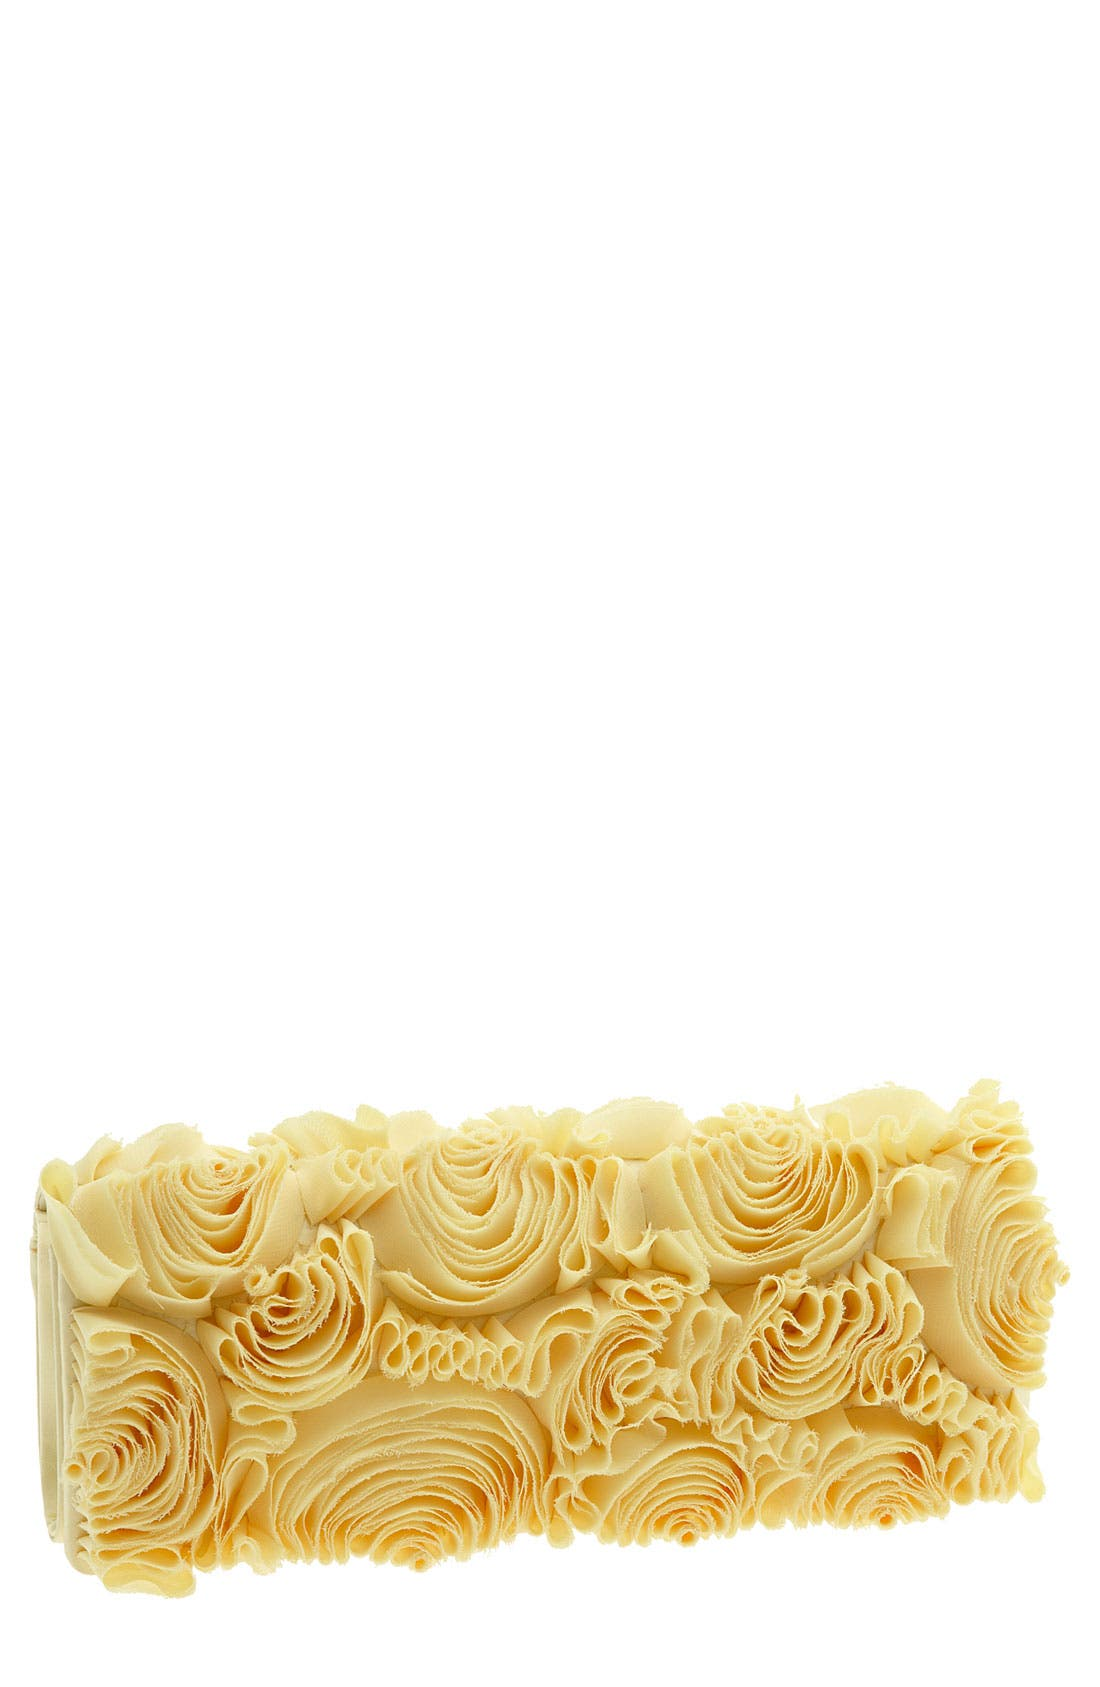 Alternate Image 1 Selected - Sondra Roberts Floral Organza Clutch